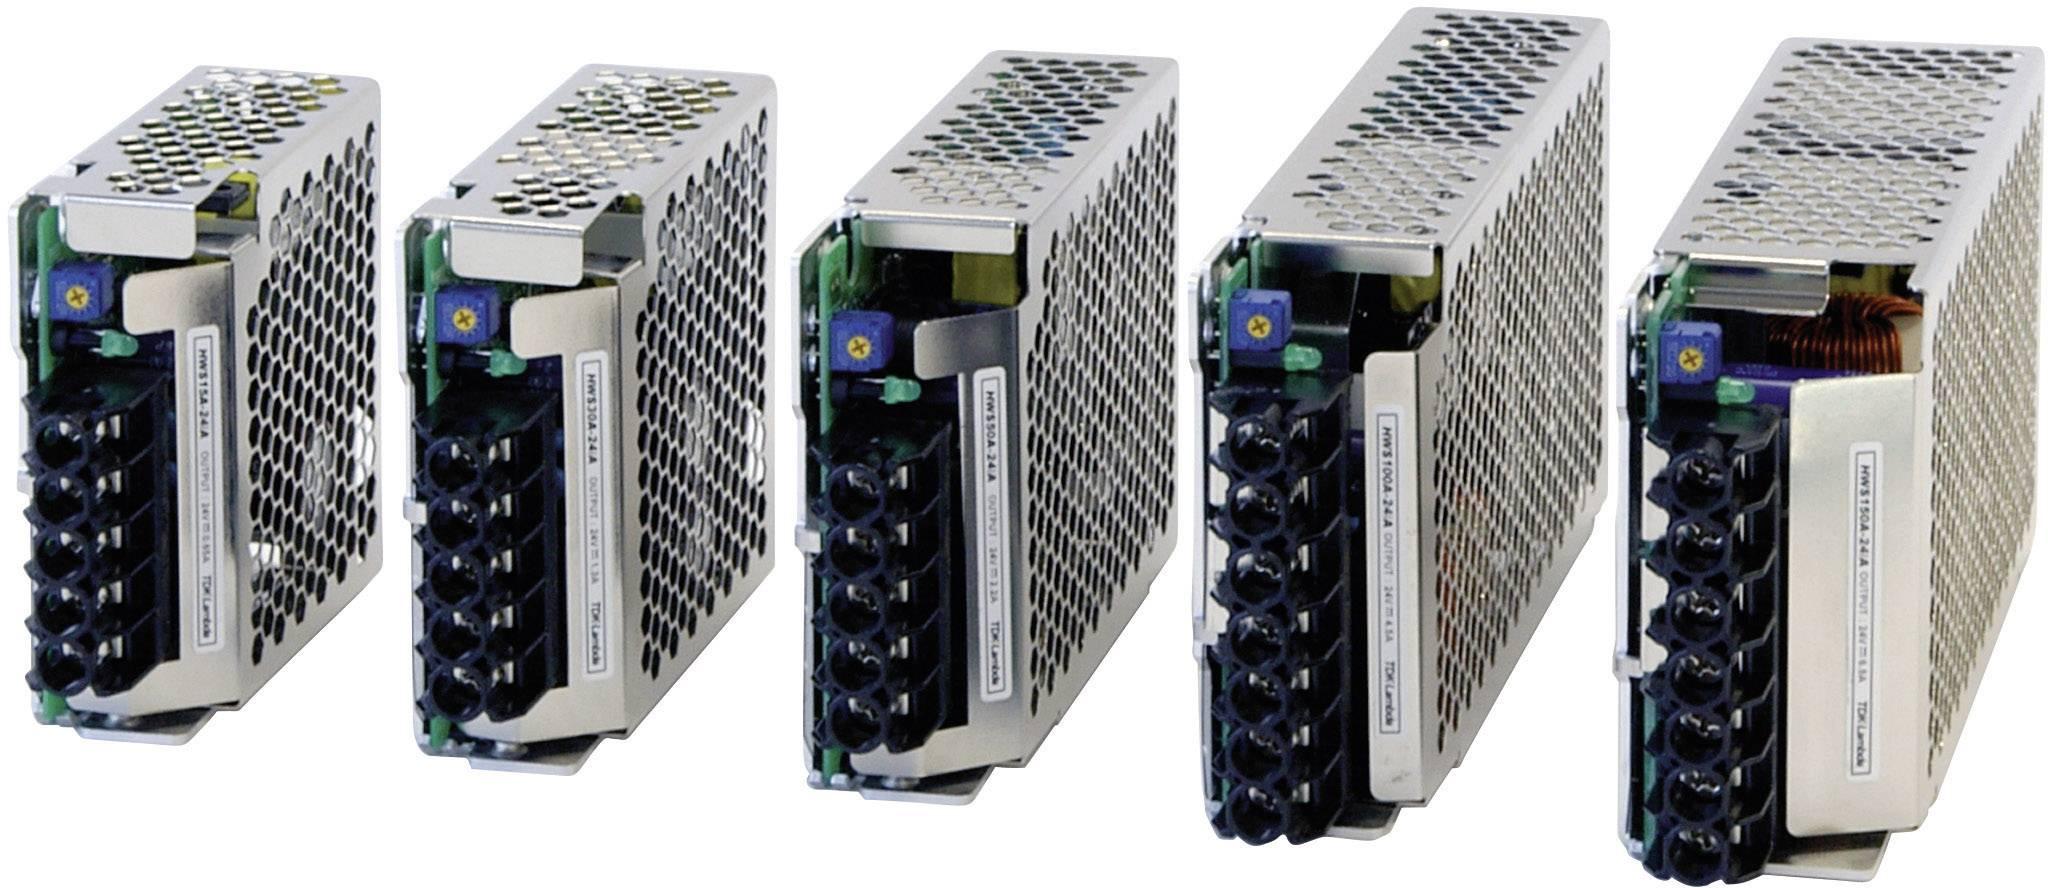 Zabudovateľný napájací zdroj TDK-Lambda HWS-50A-12/A, 12 V, 51,6 W